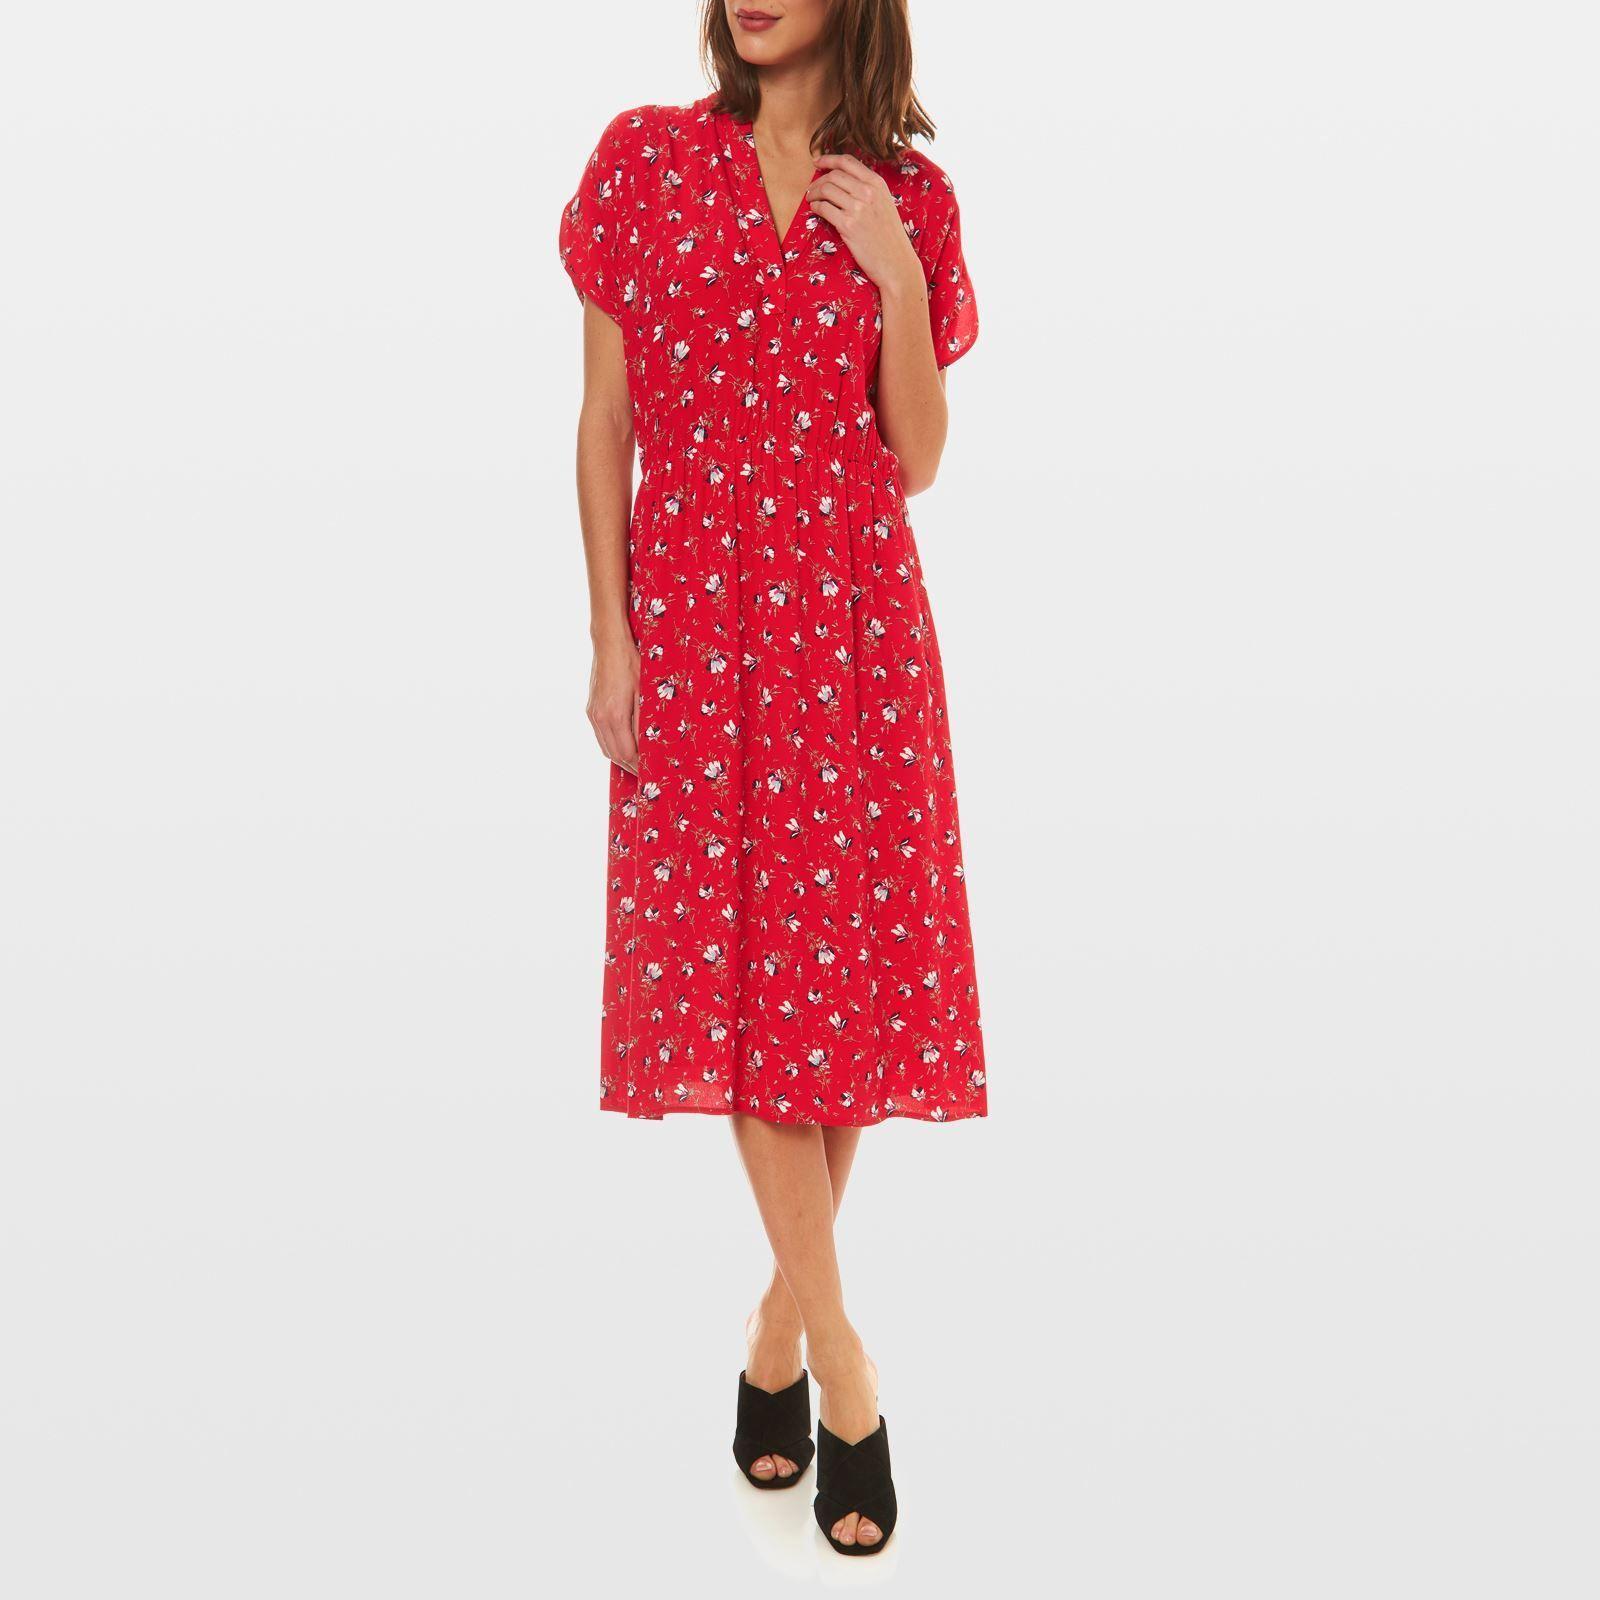 Caroll Stella Robe Fluide Imprime Fleurs Rouge Robe Fluide Robe Robes Sans Manche